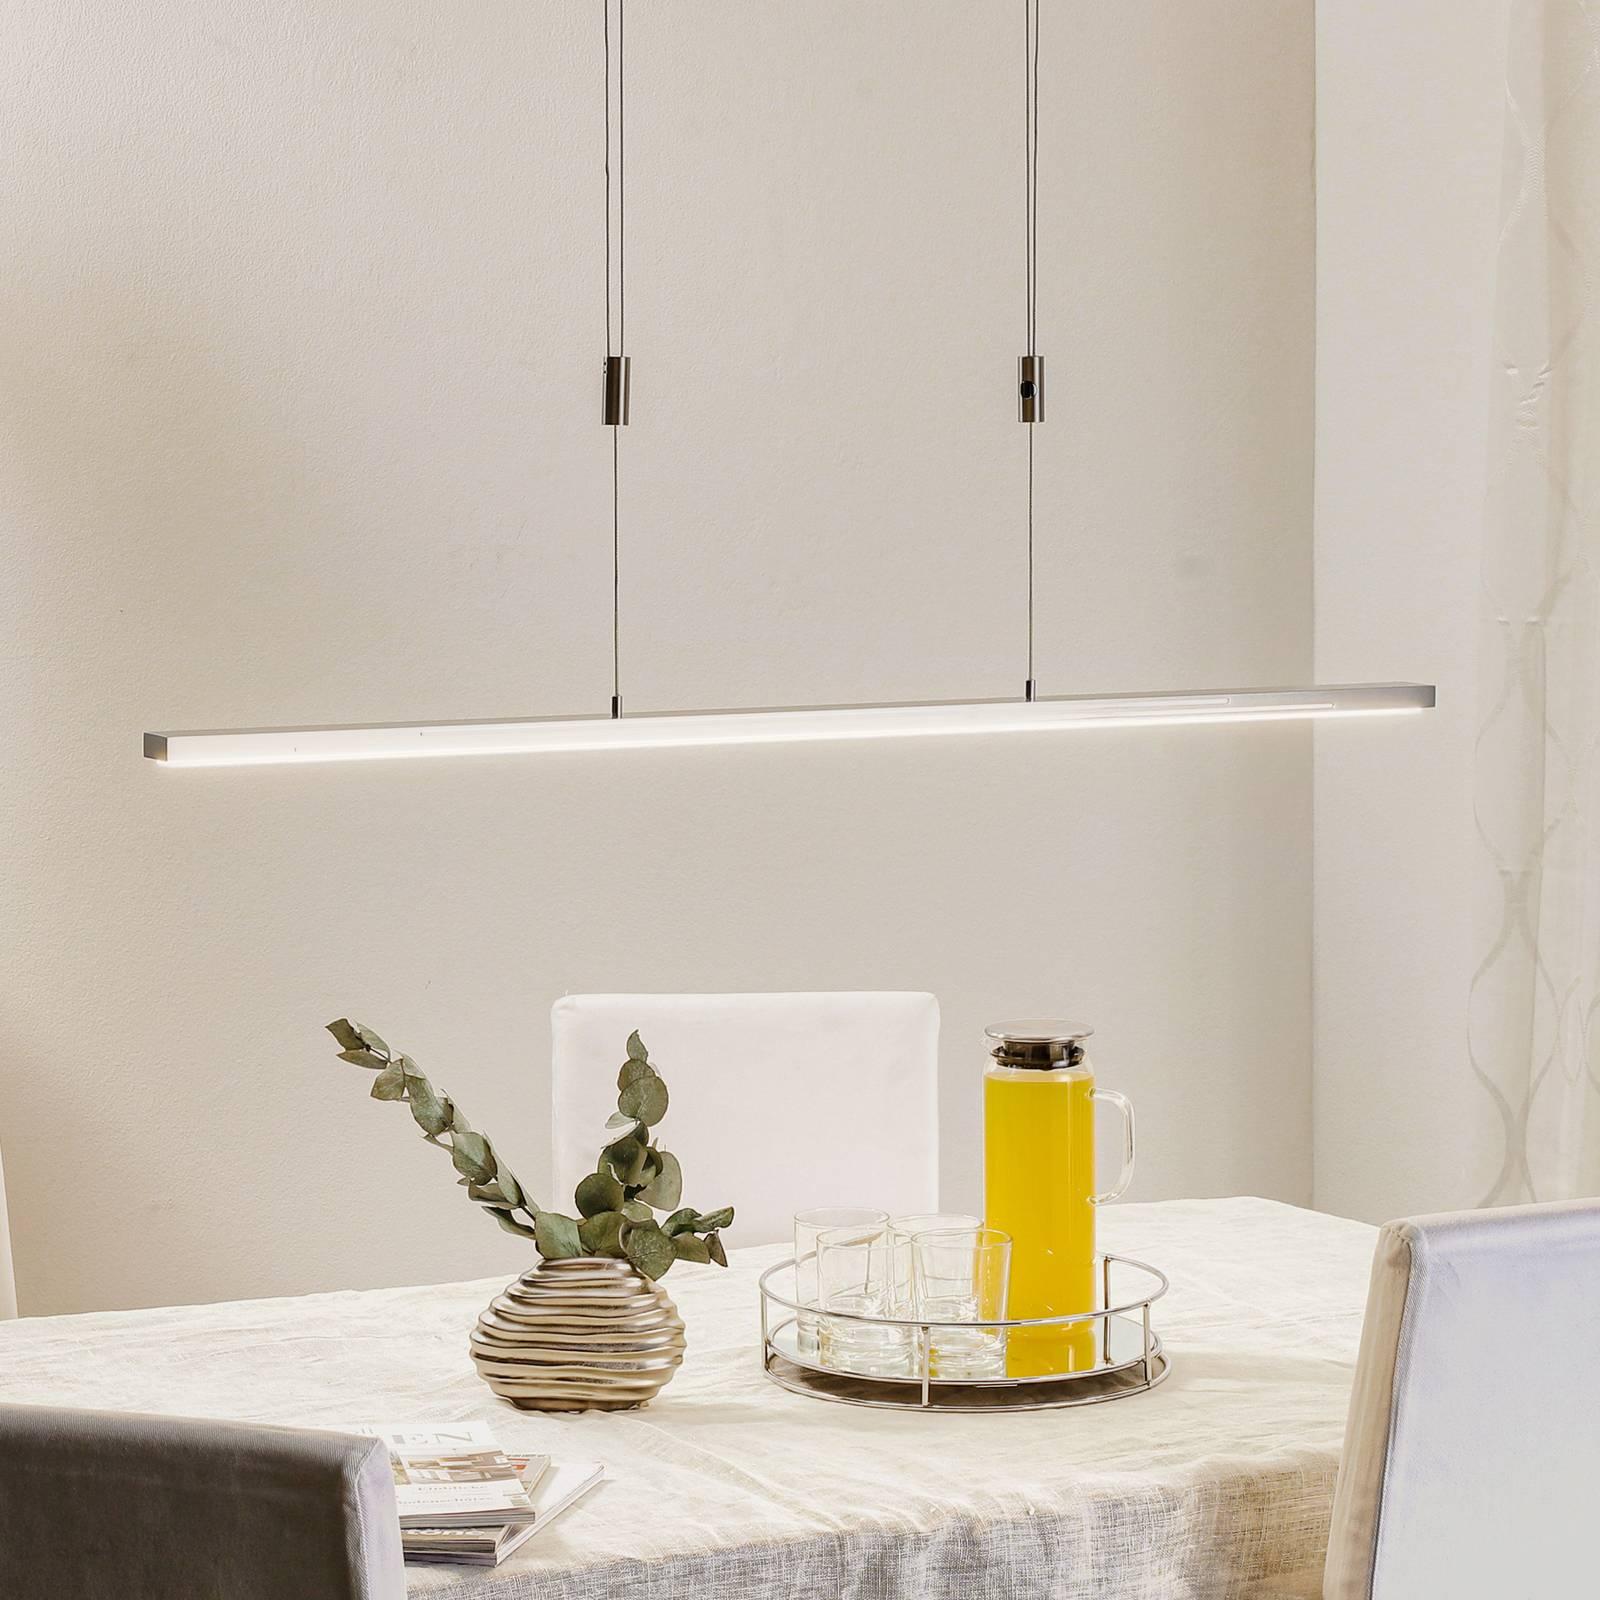 BANKAMP Swing LED-riippuvalo, Smart-Home-yhteys